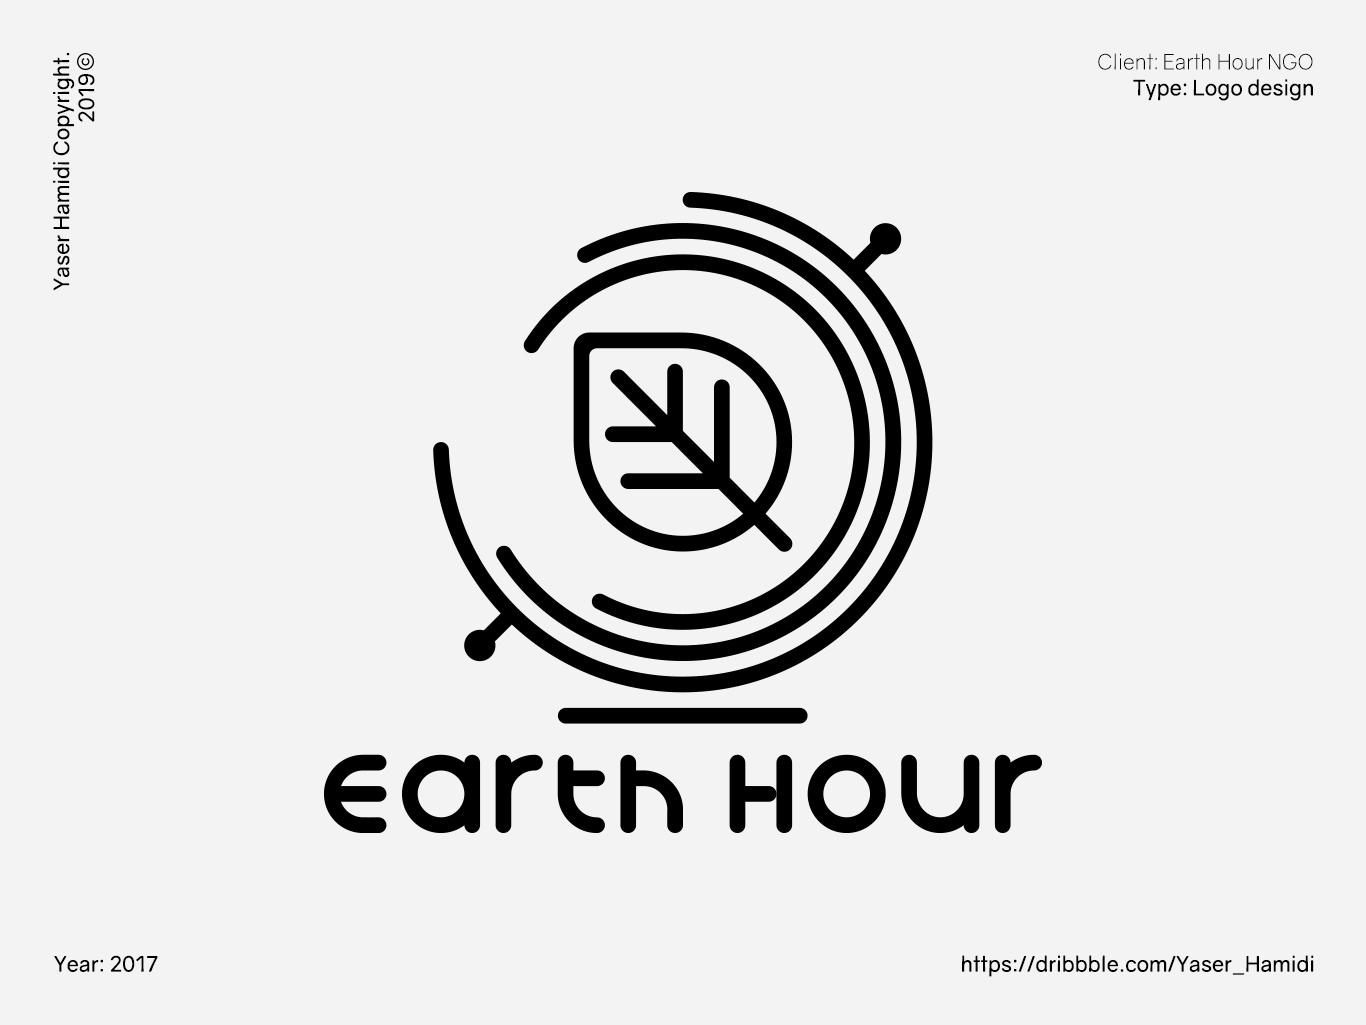 Earth Hour NGO | کمپین ساعت زمین vector typography design branding symbol logotype logotipo logoinspiration logodesign logo icon illustrator illustration brand design